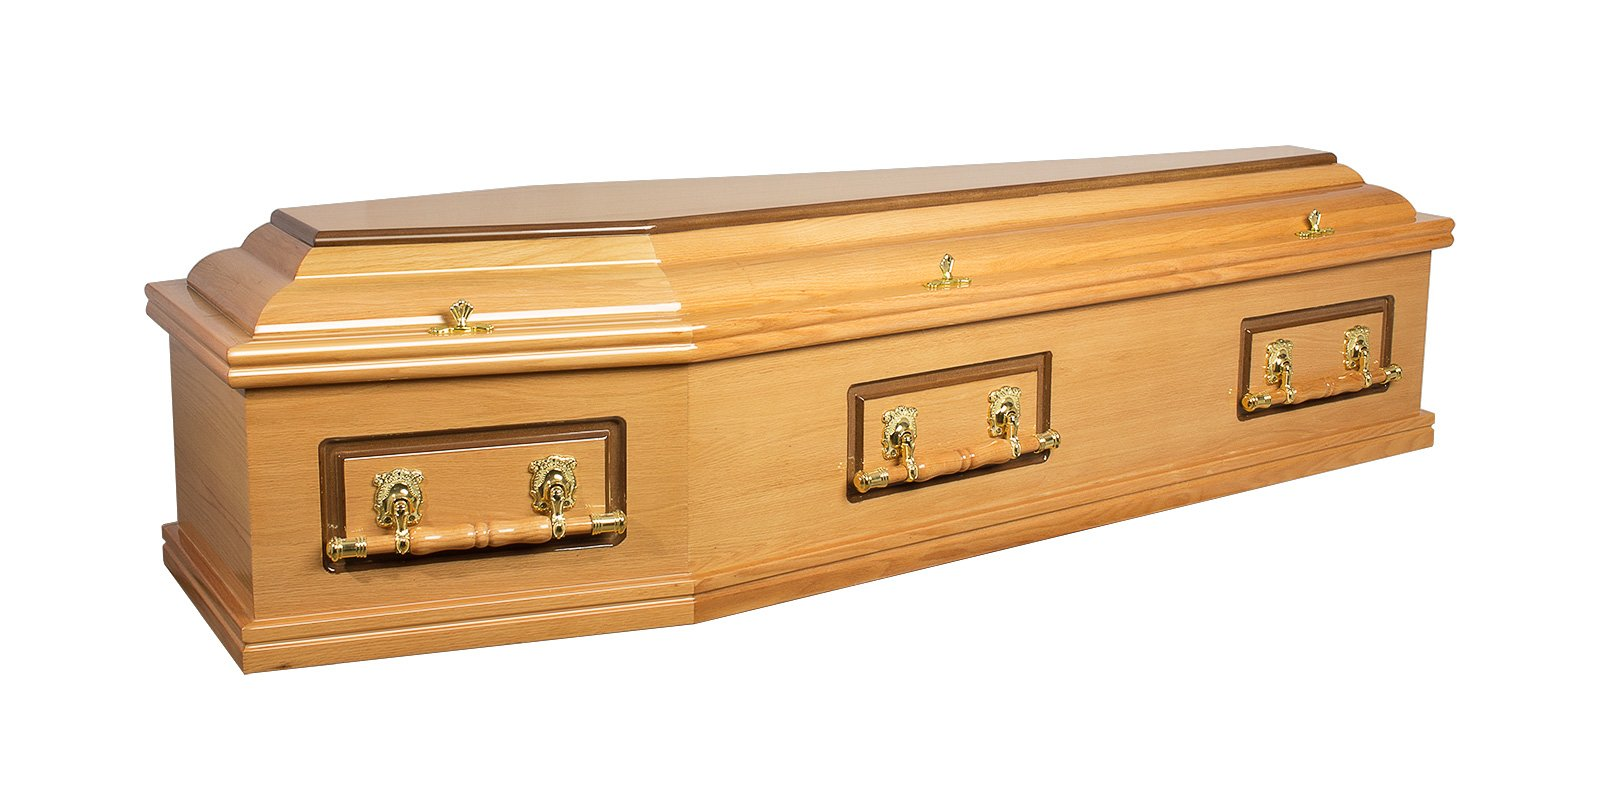 sydney-coffins-kelsea-pecan-coffin